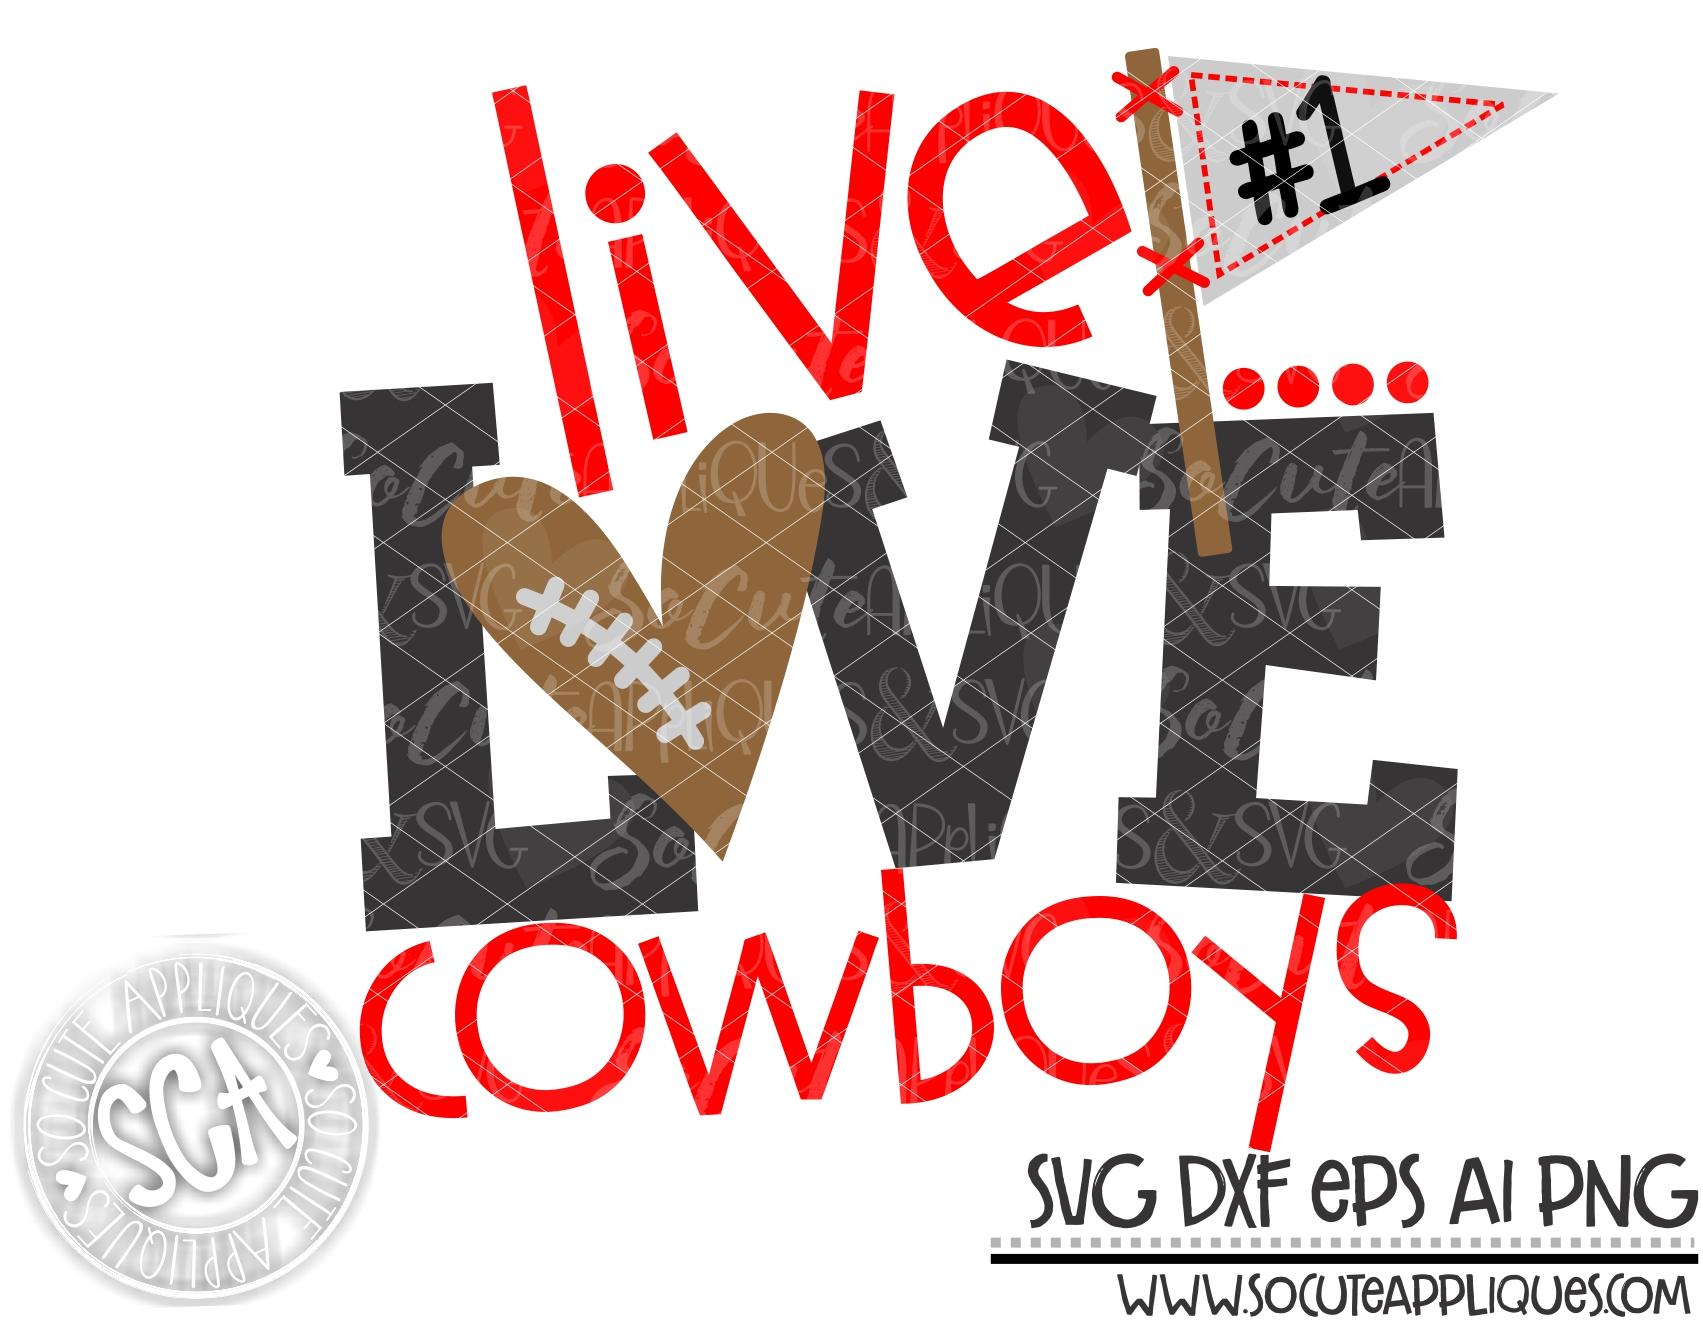 Download live love cowboys football 18 svg sca — socuteappliques.net